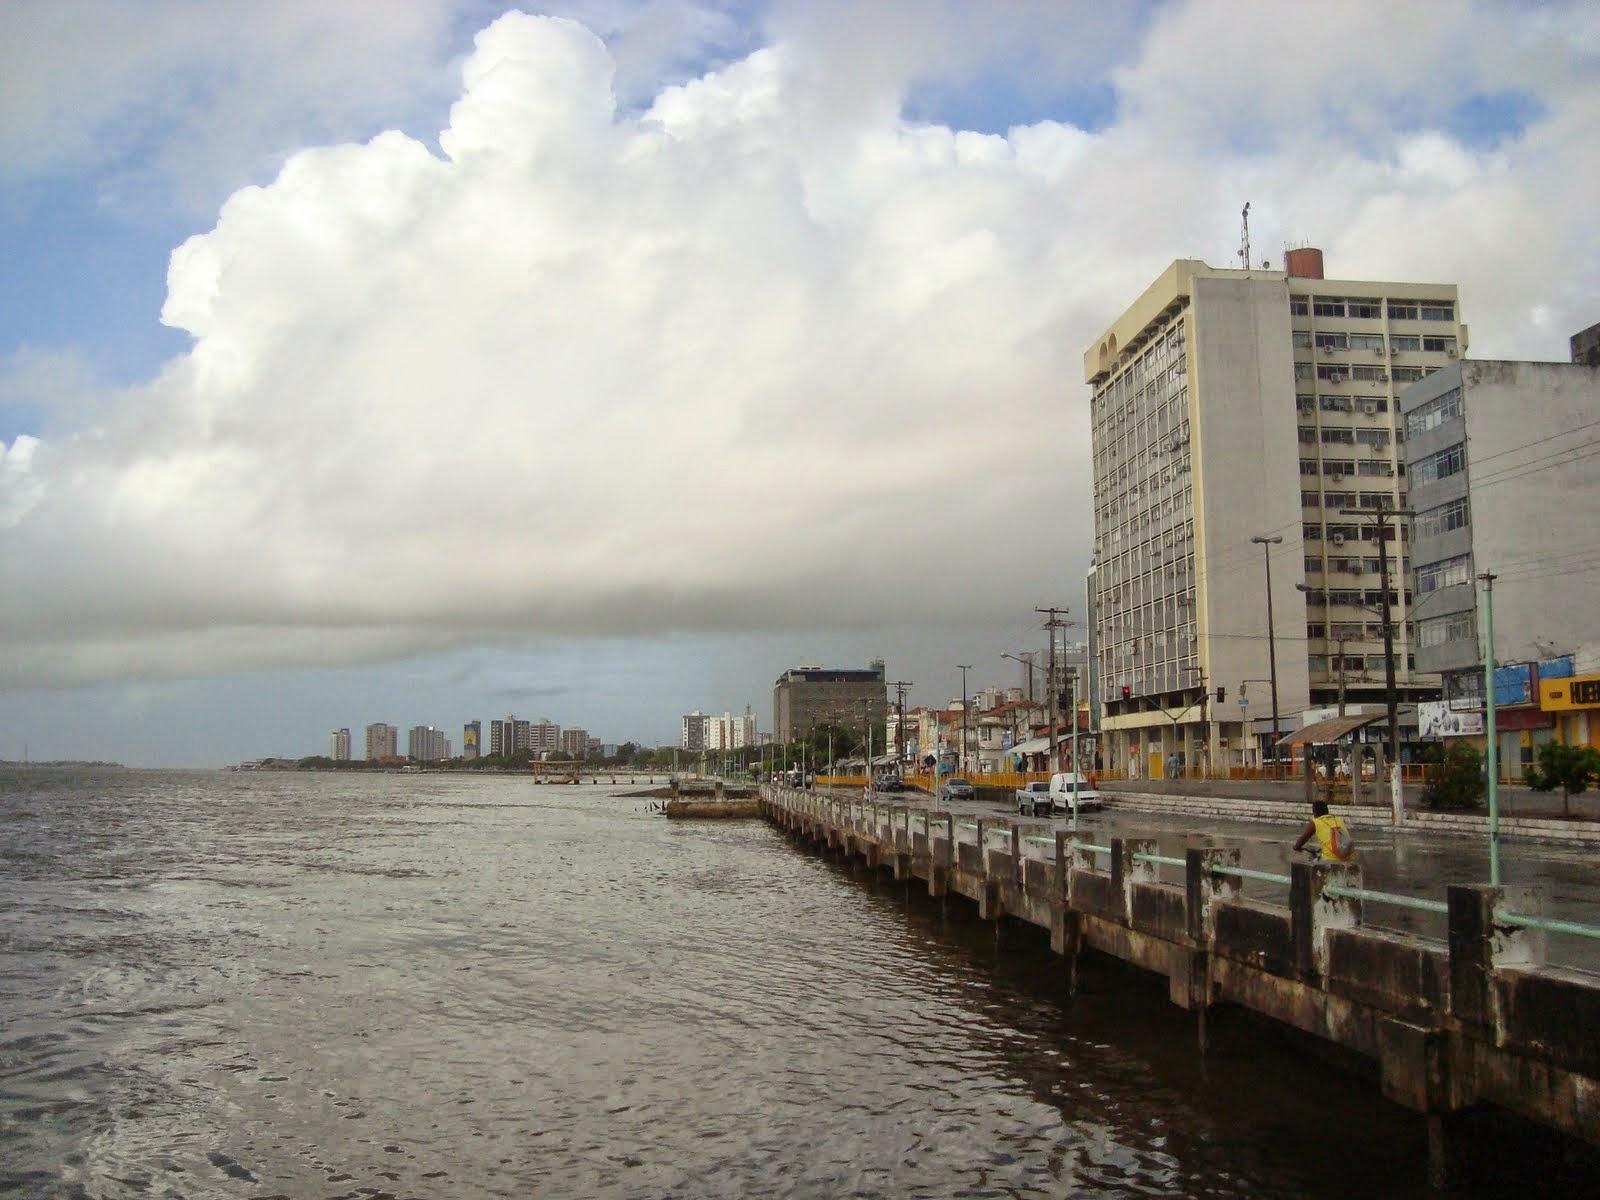 Adolescente de 17 anos morre afogado no Rio Sergipe